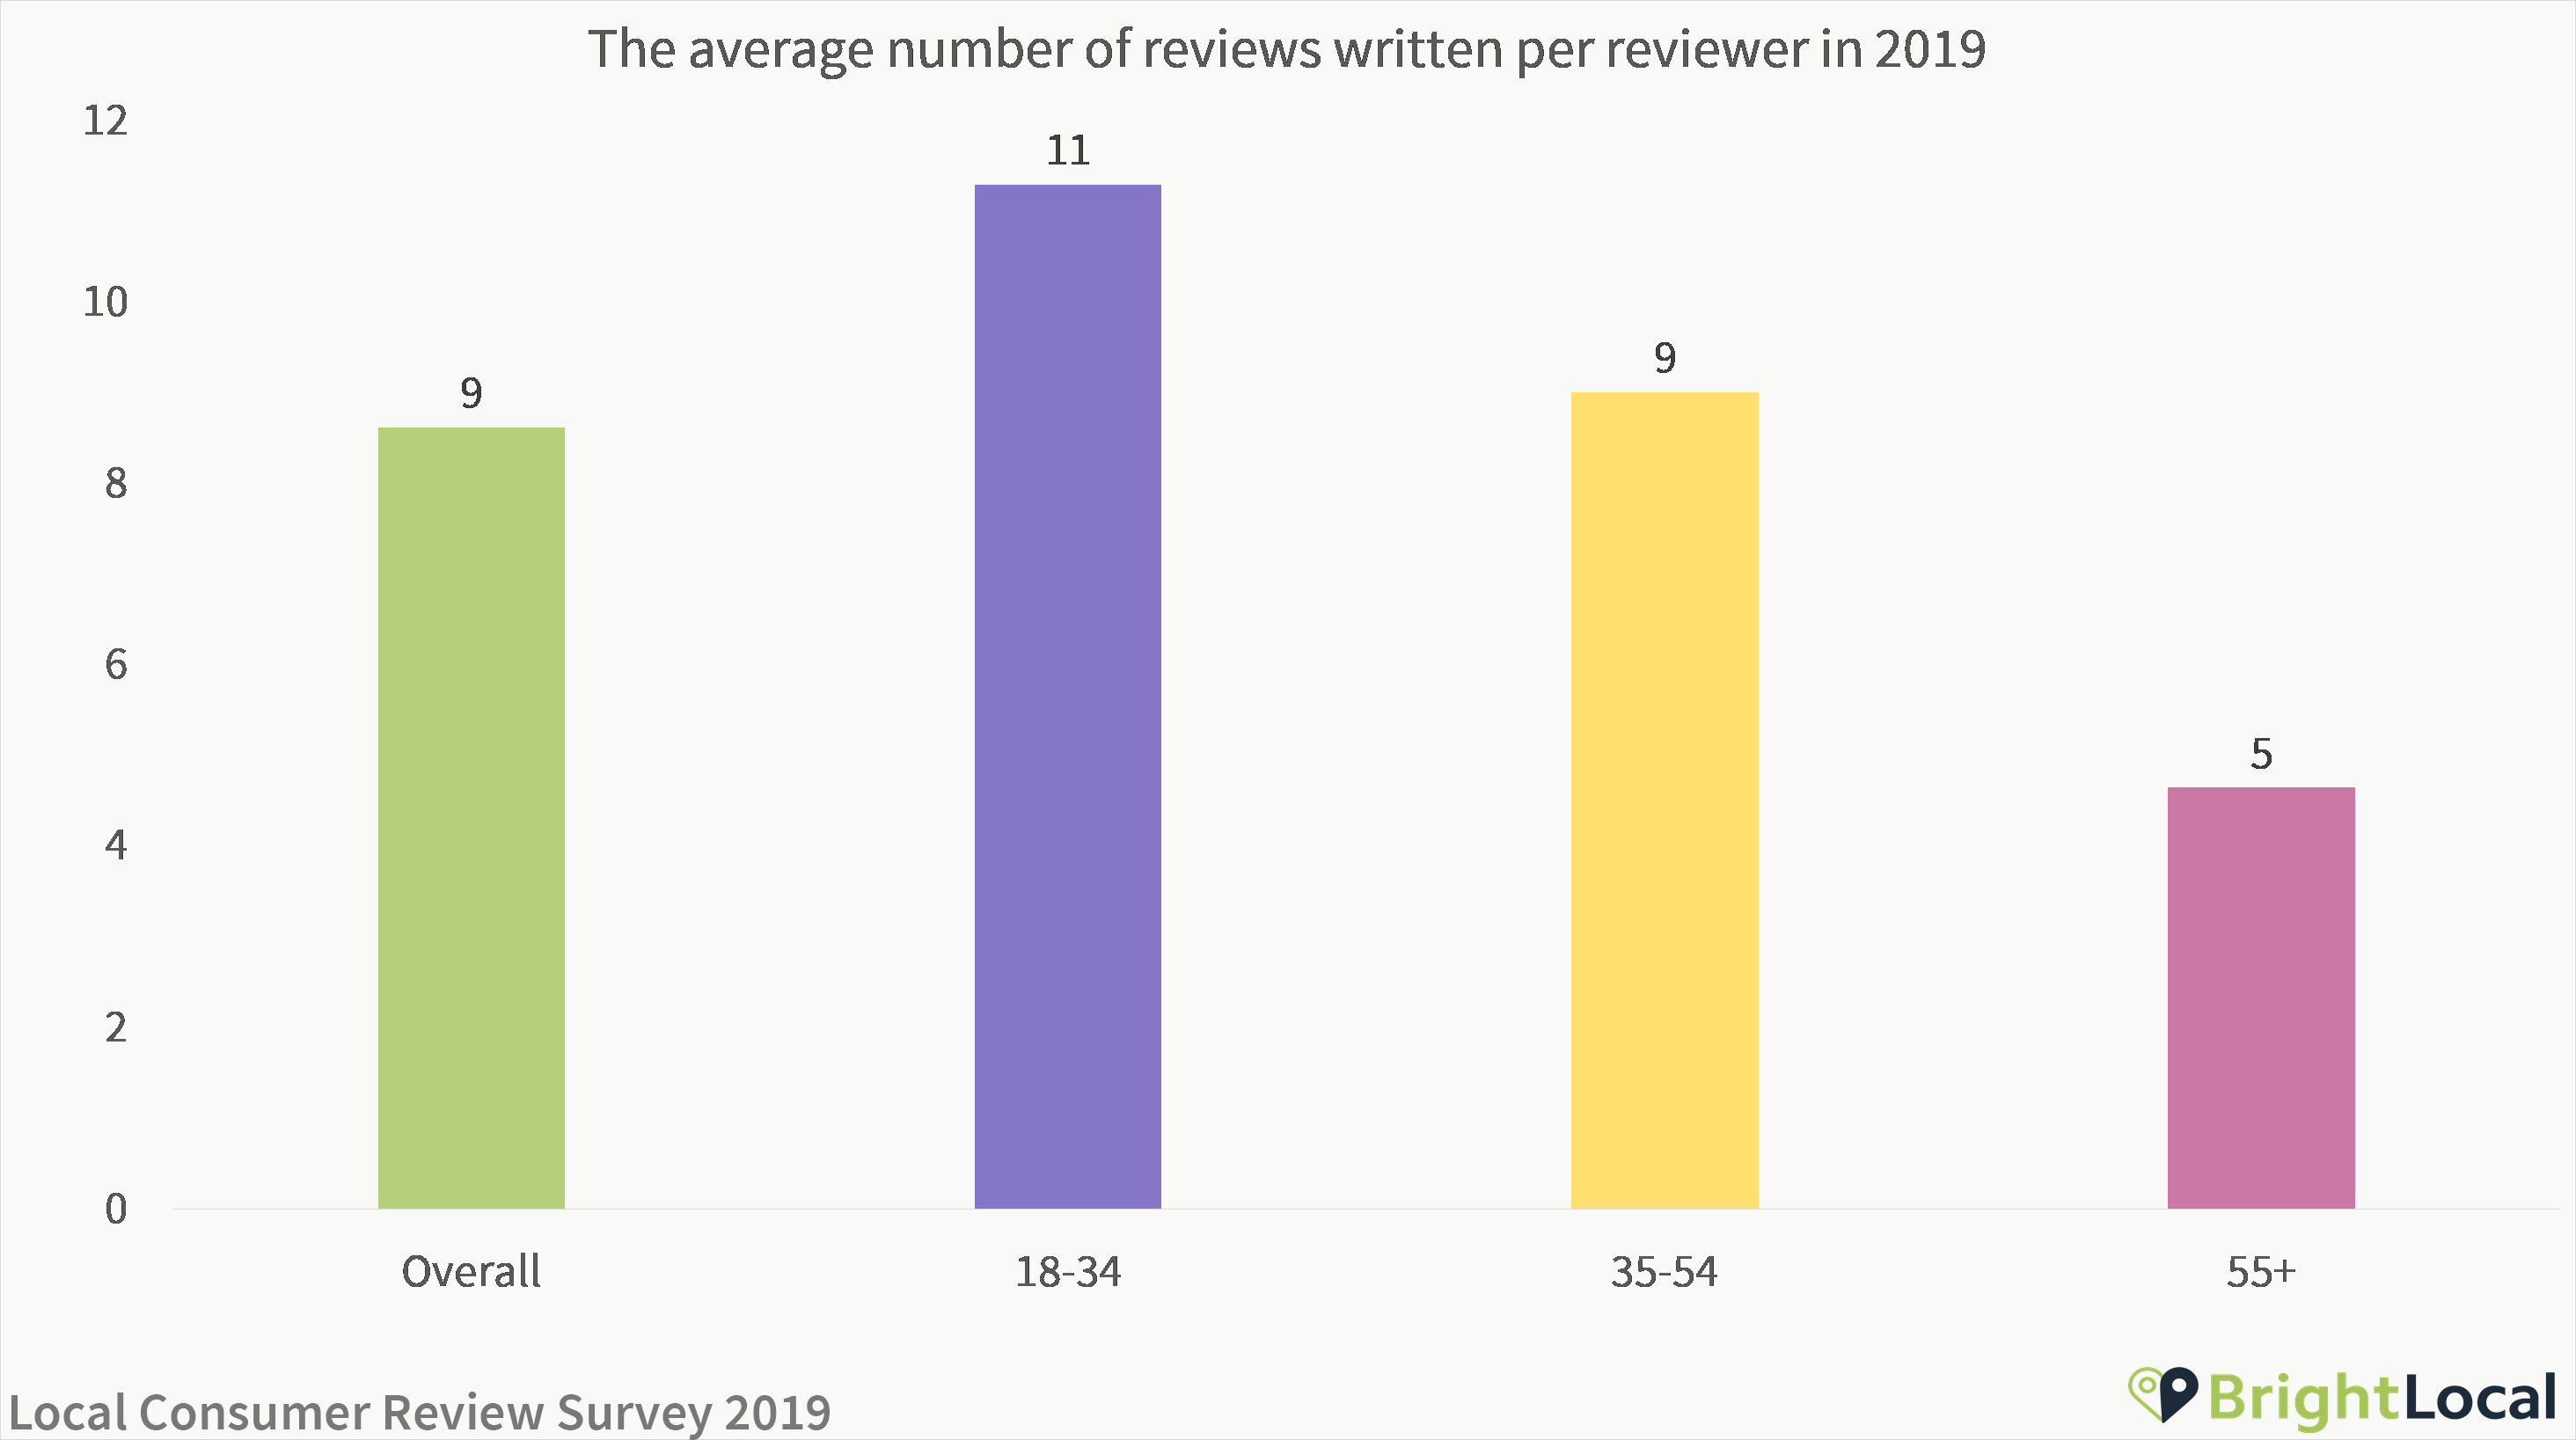 Average reviews written per reviewer